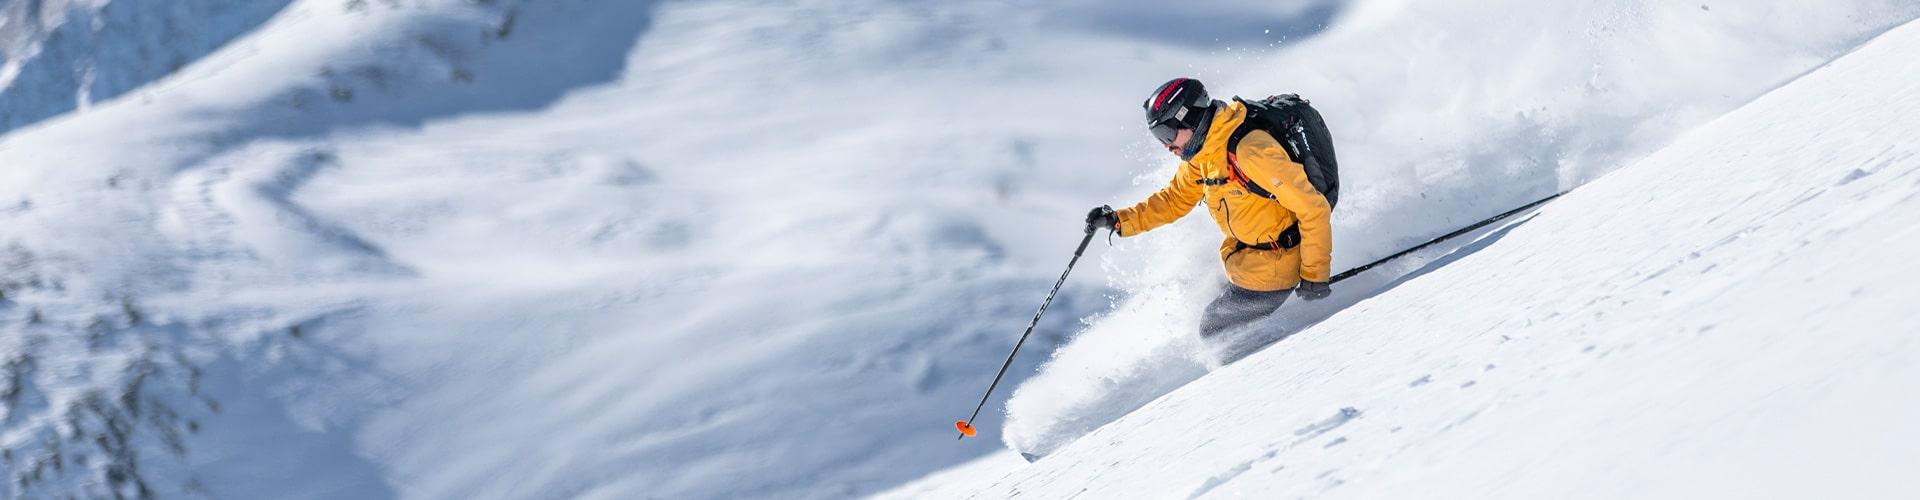 Livigno Off Piste Ski